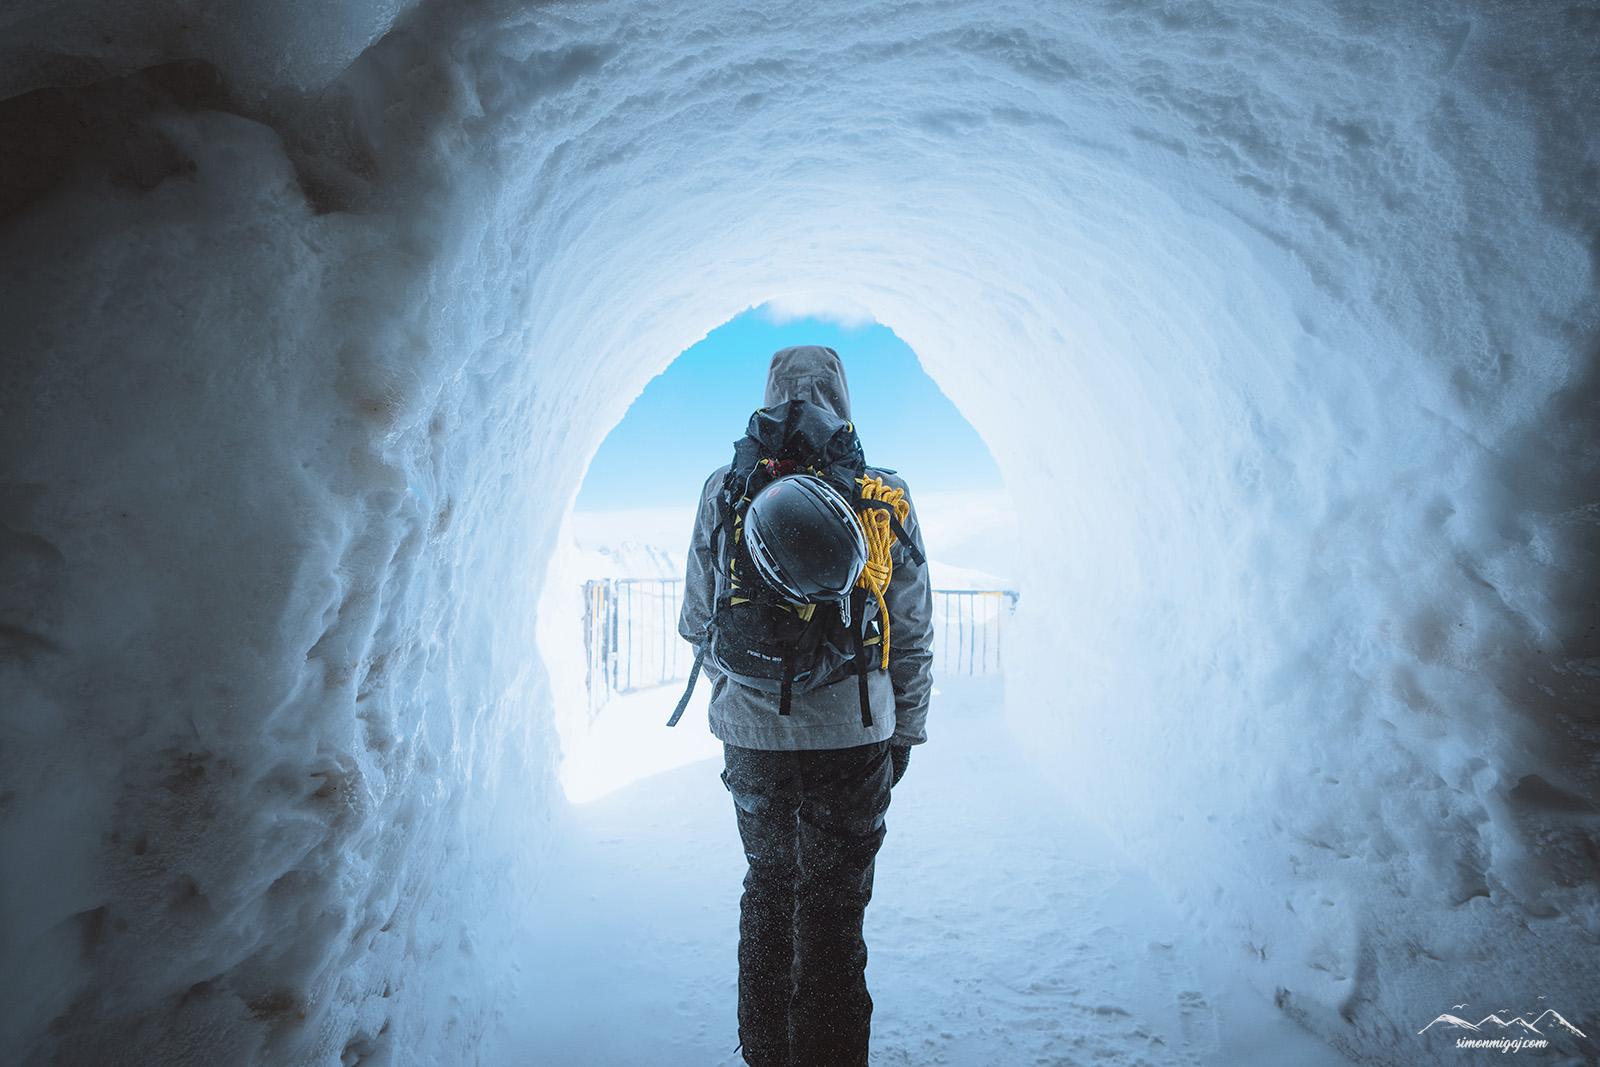 walking-out-ice-cave-aiguille-du-midi.jpg